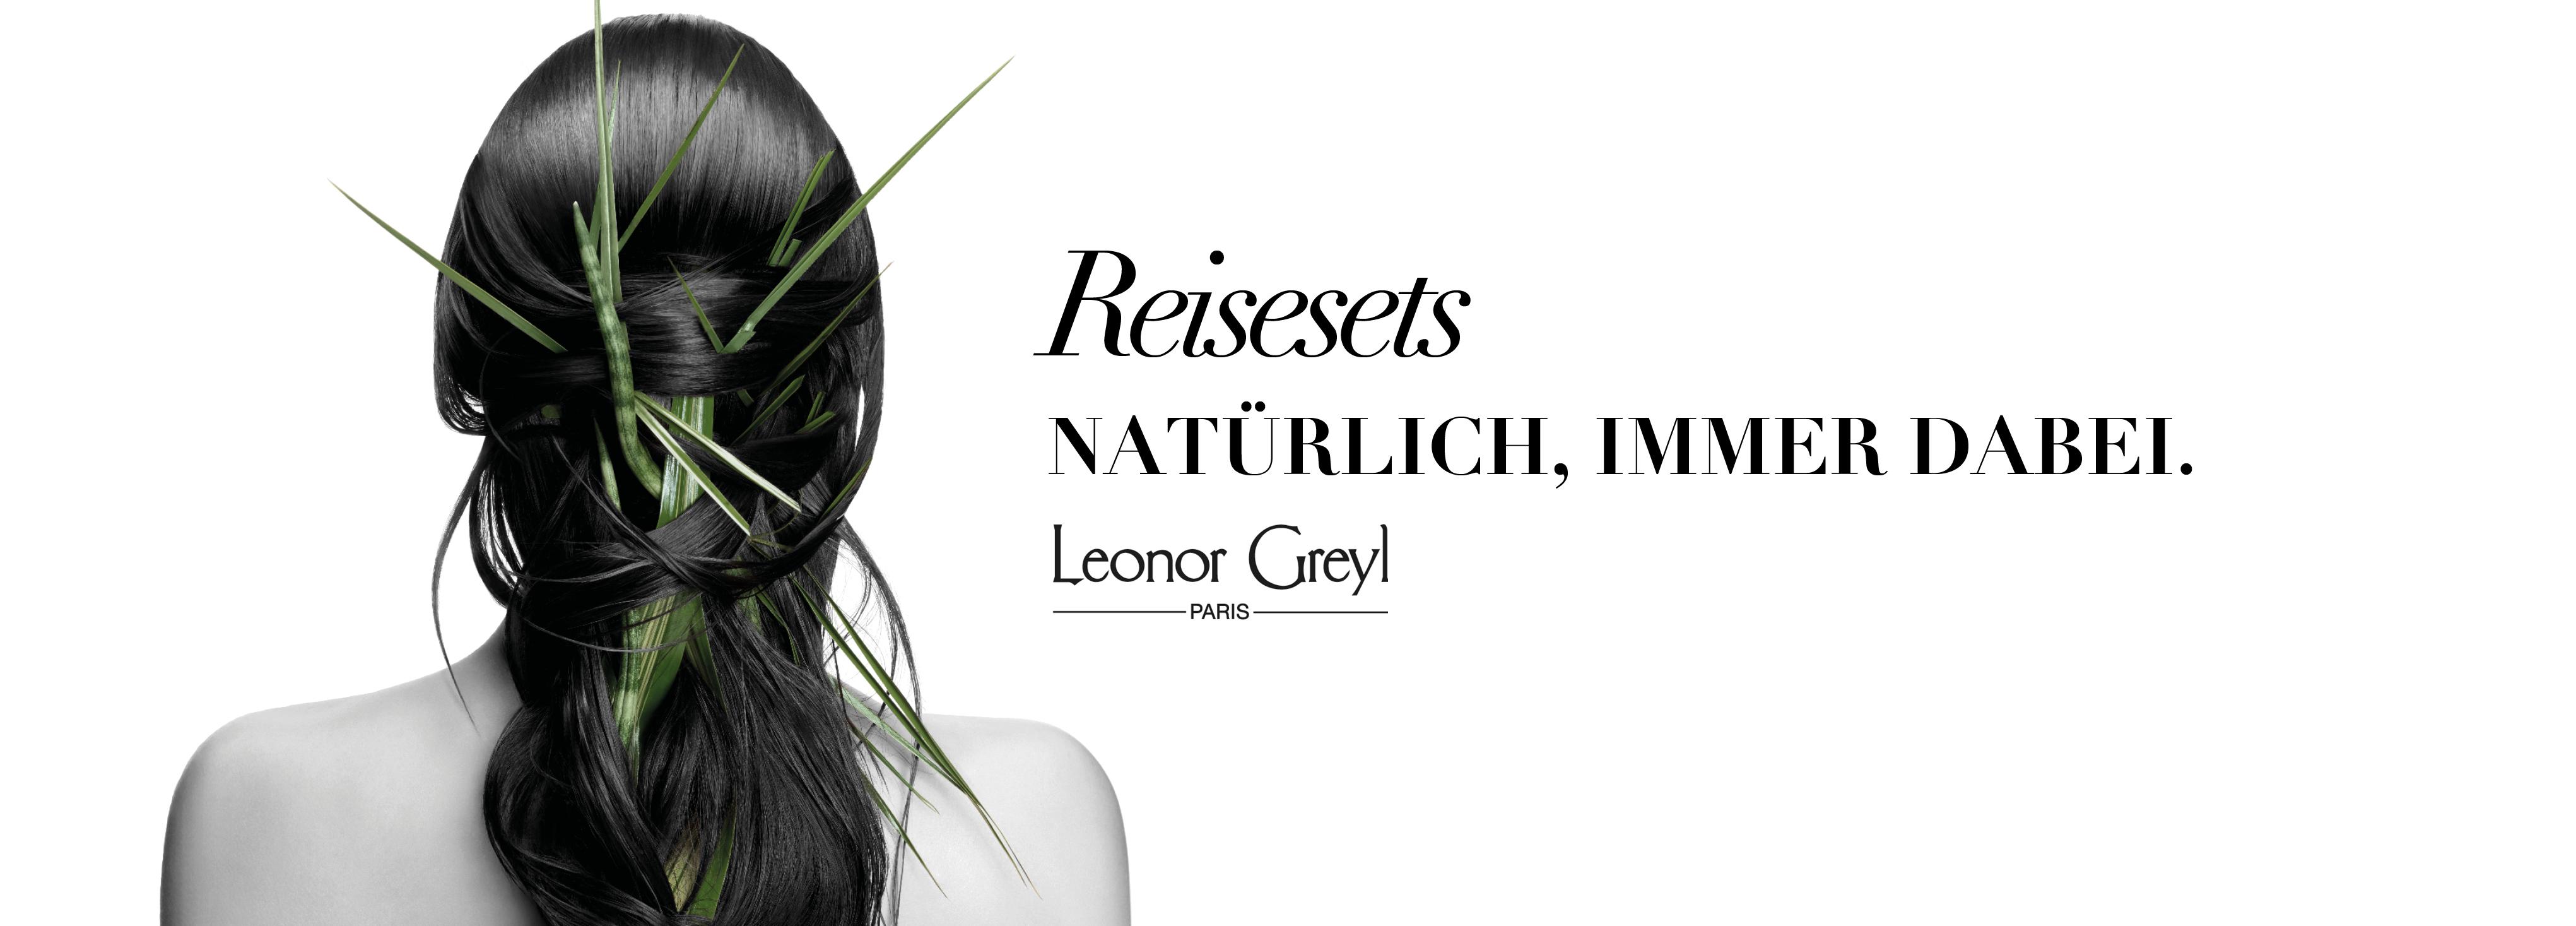 Leonor Greyl Reisesets